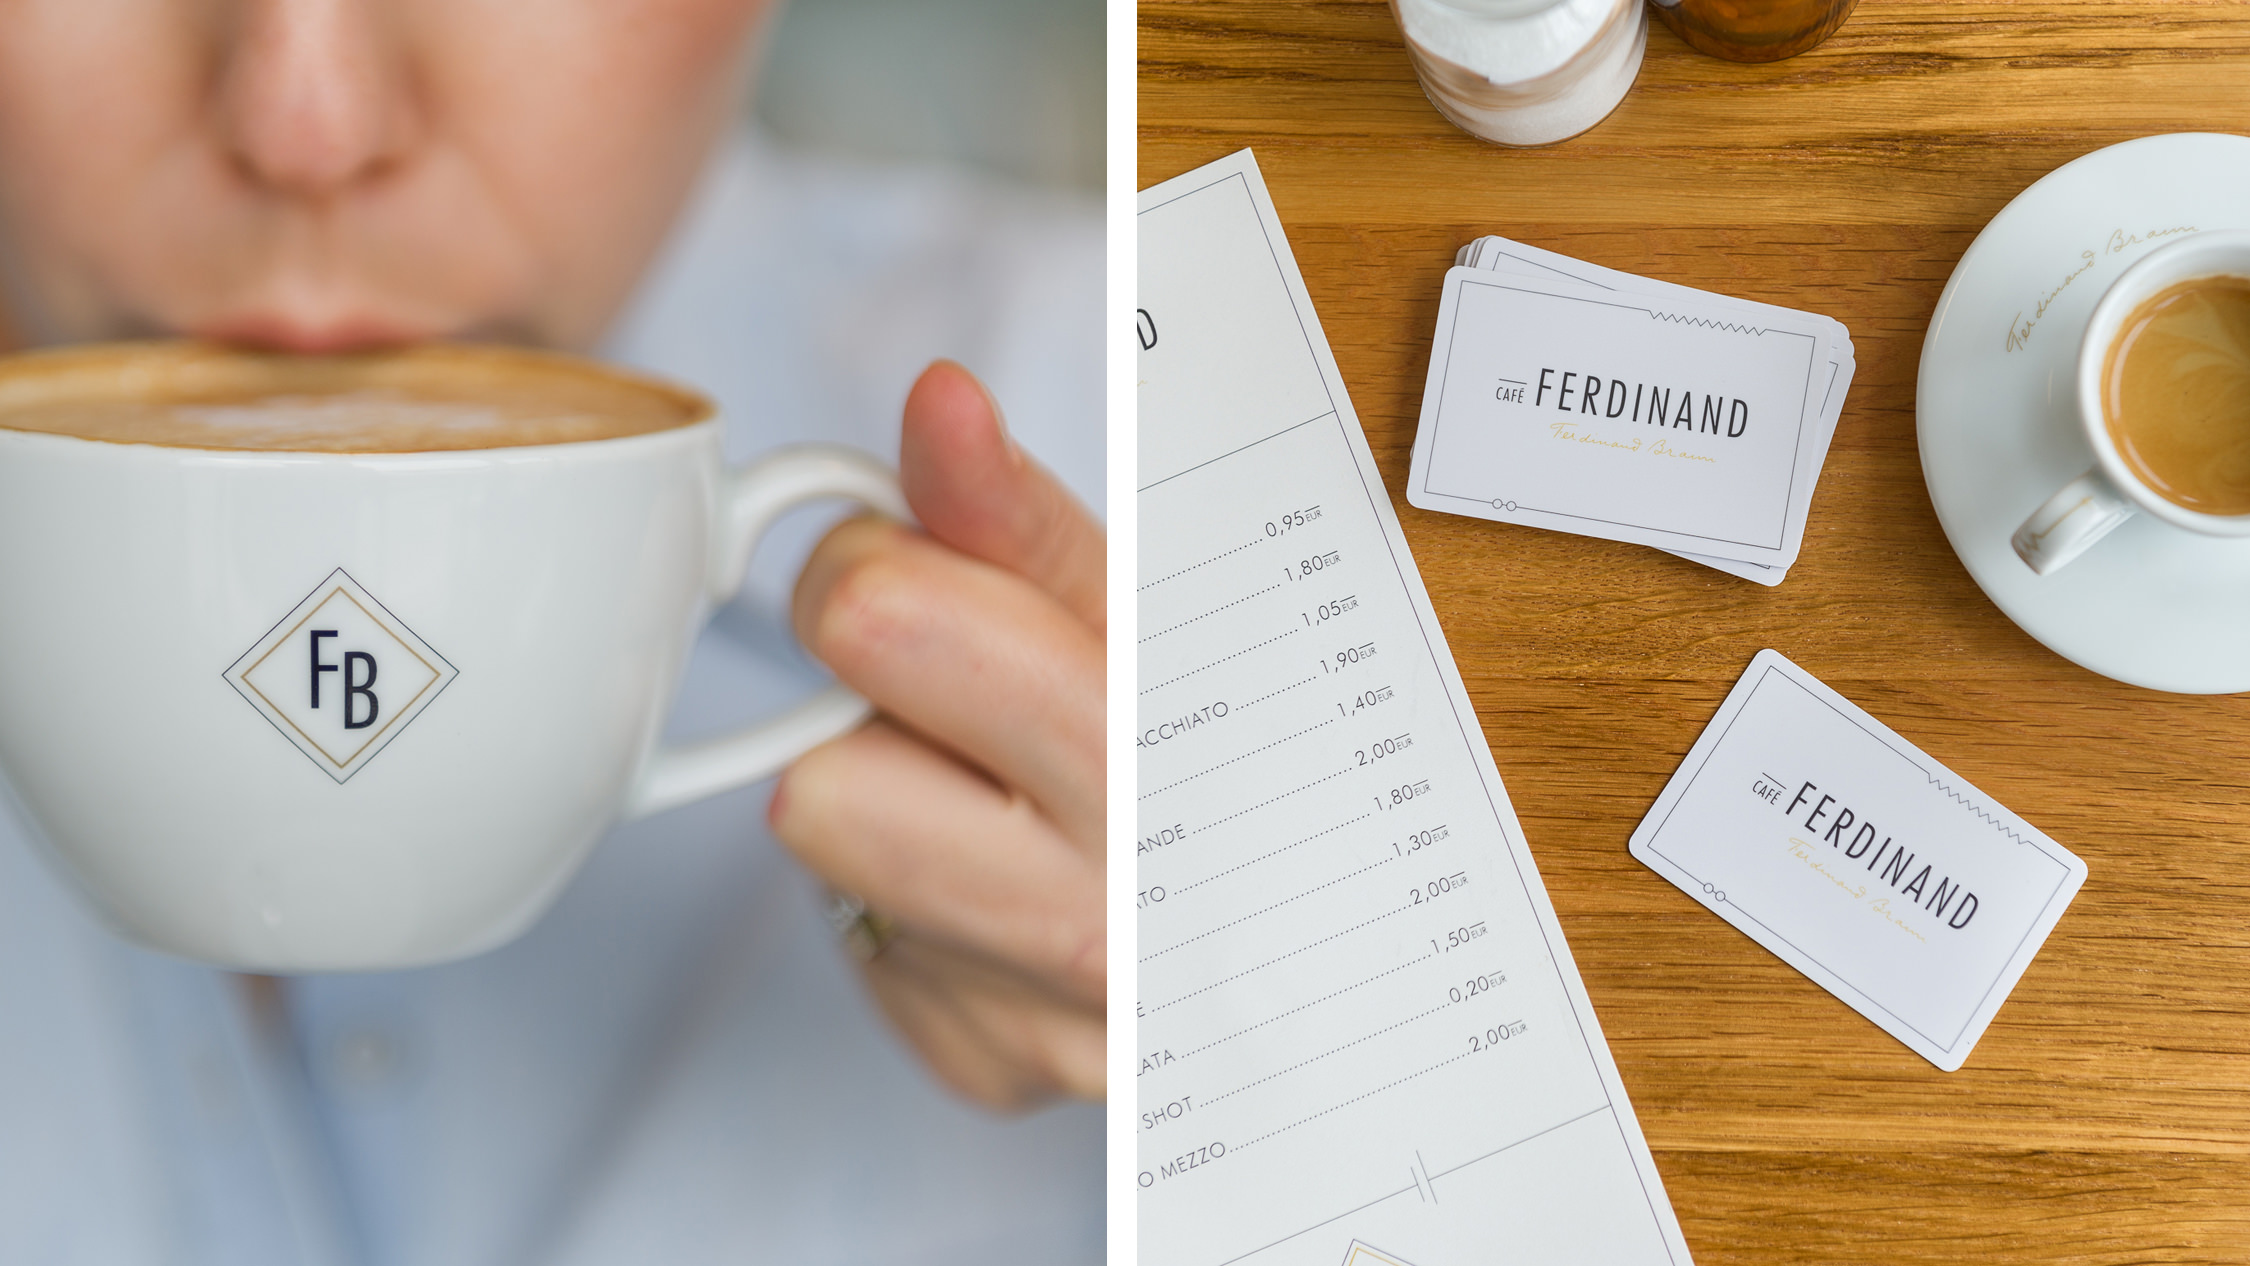 Café-ferdinand-hamburgo-alemania-diseño-aerogram-studio-9